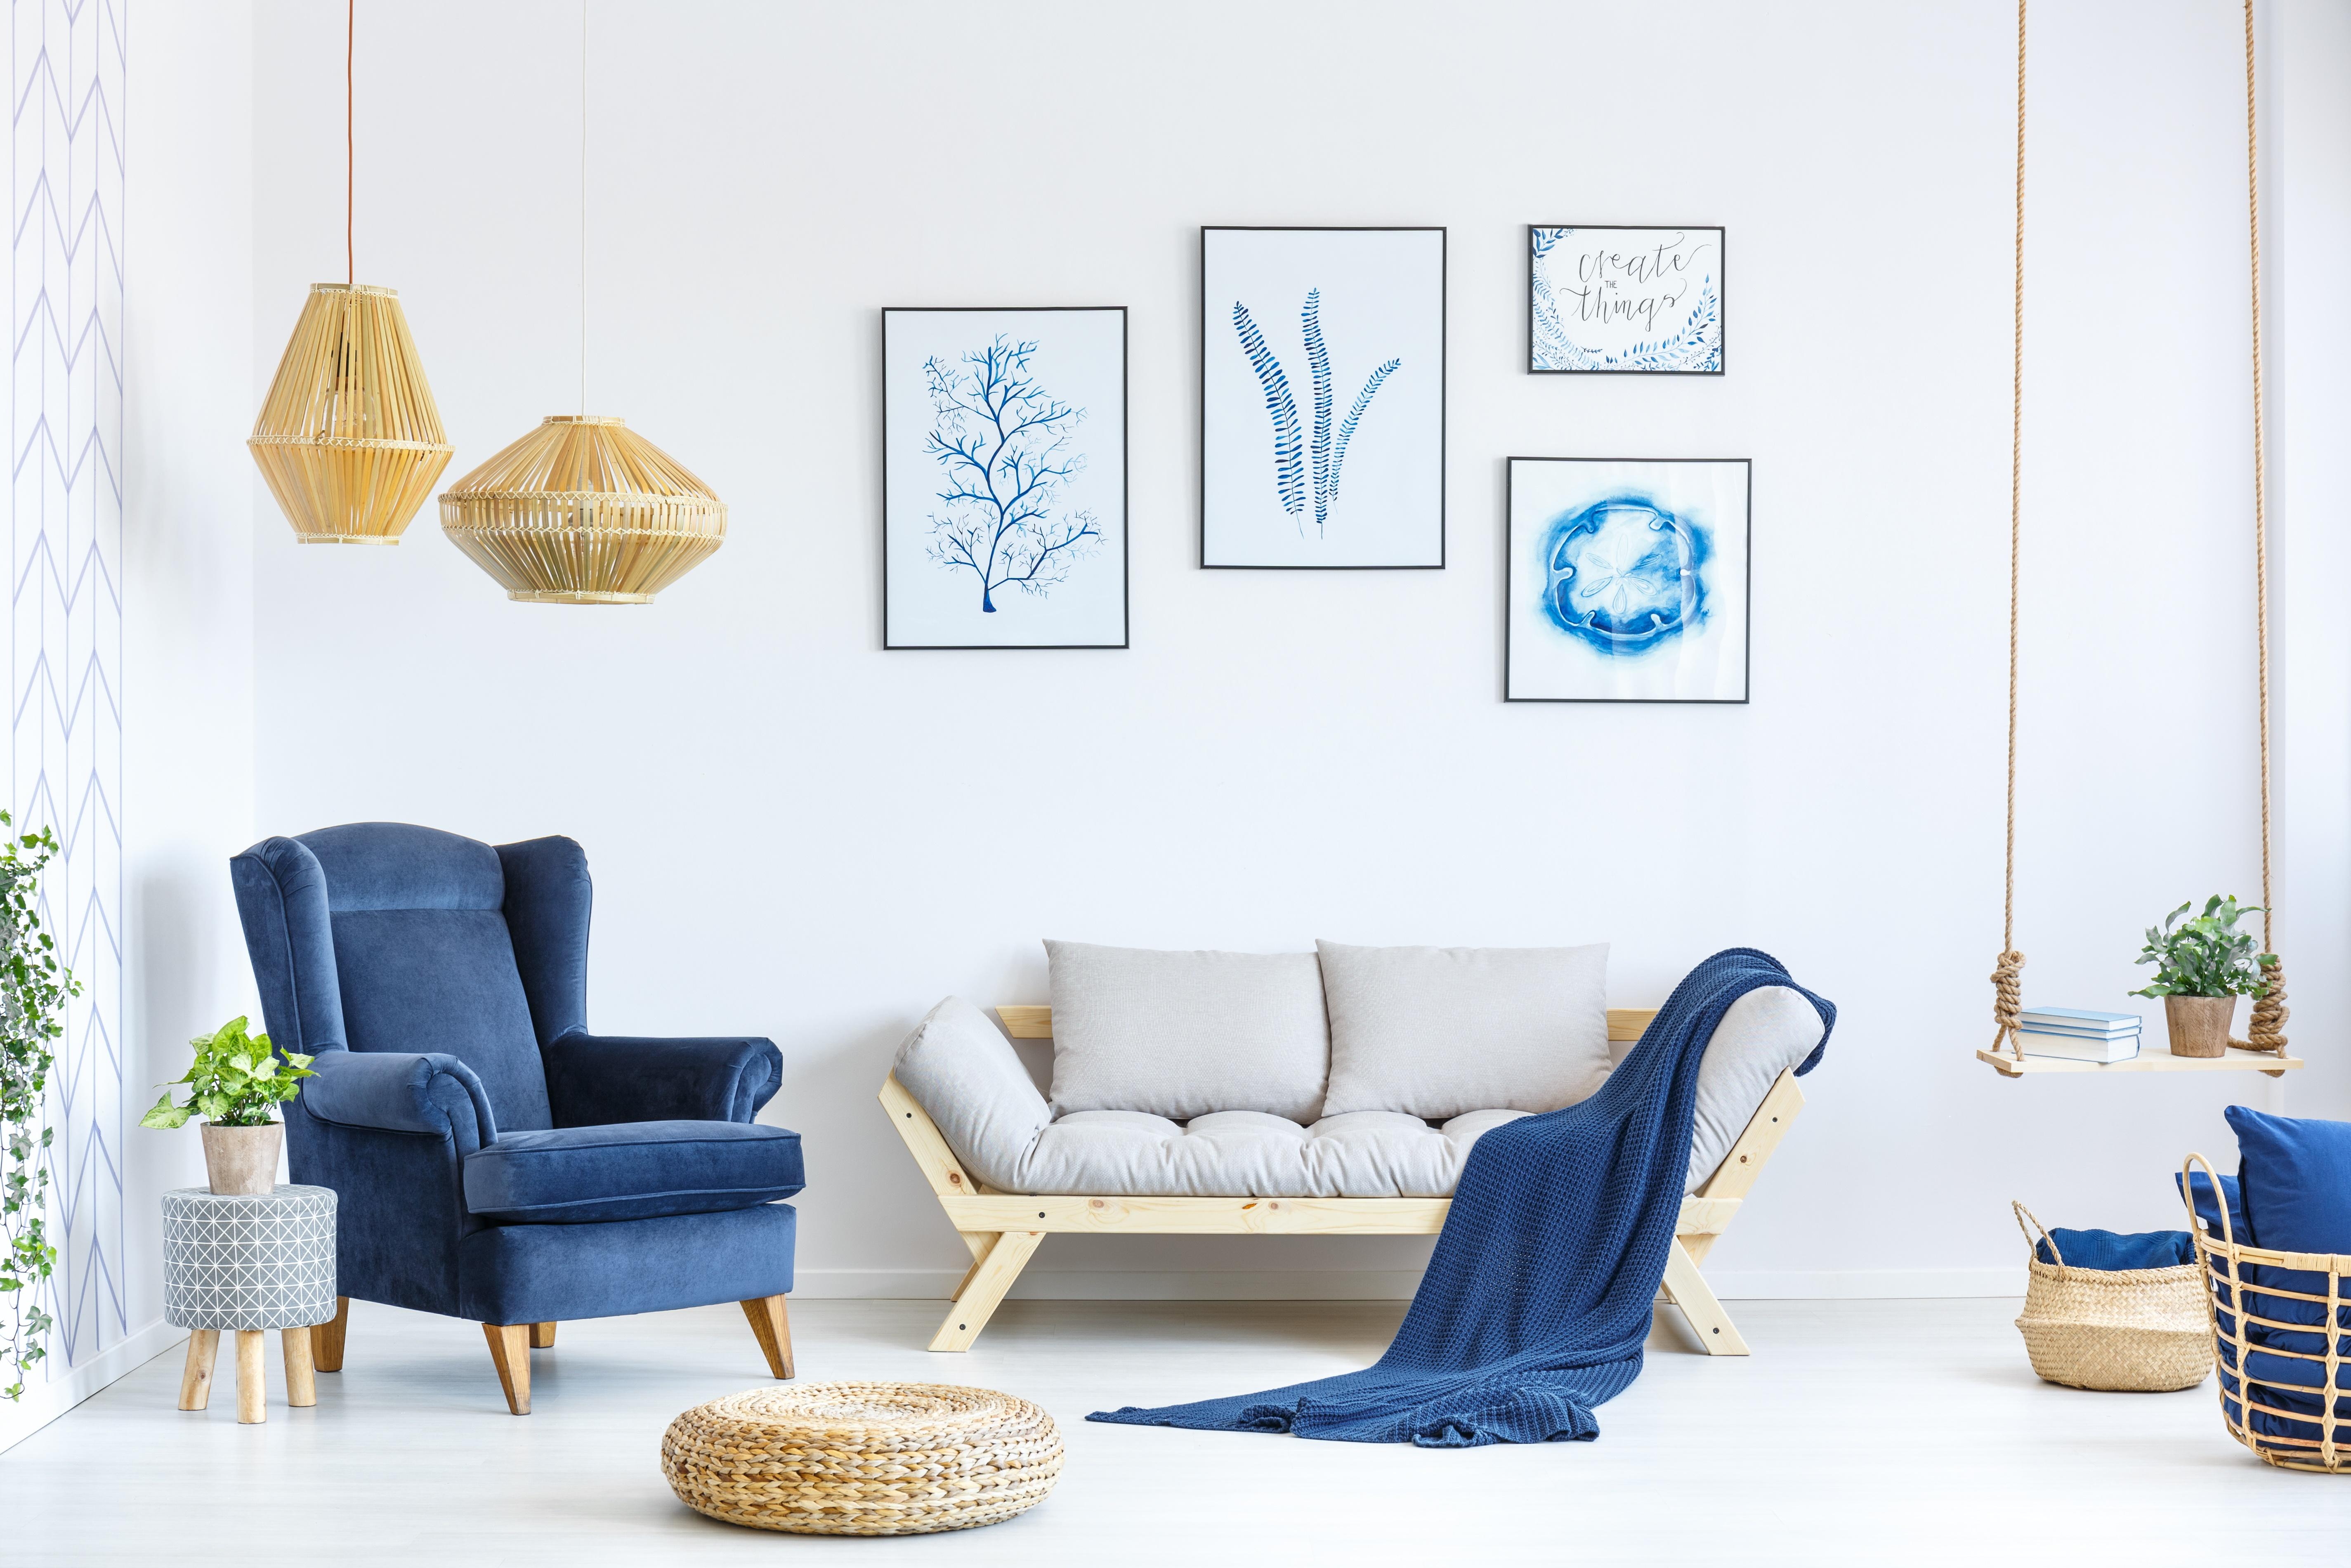 Design de interiores 1.jpg